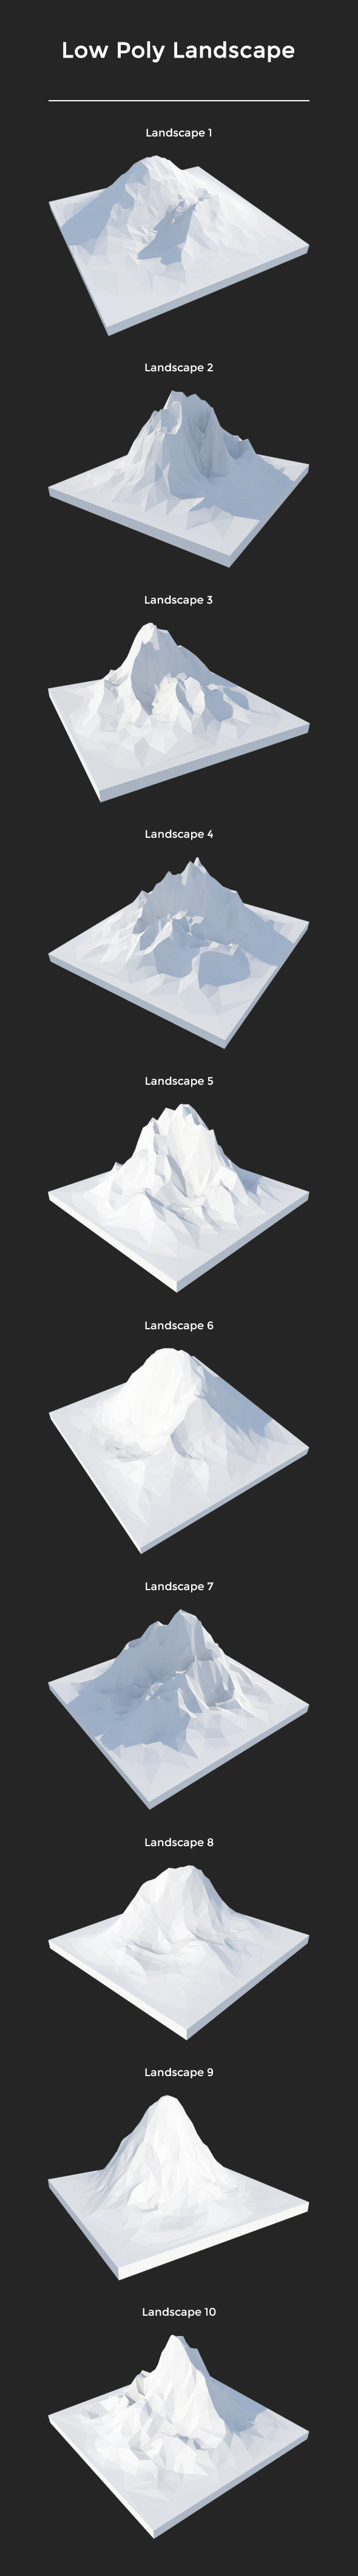 Pack Low Poly Landscape